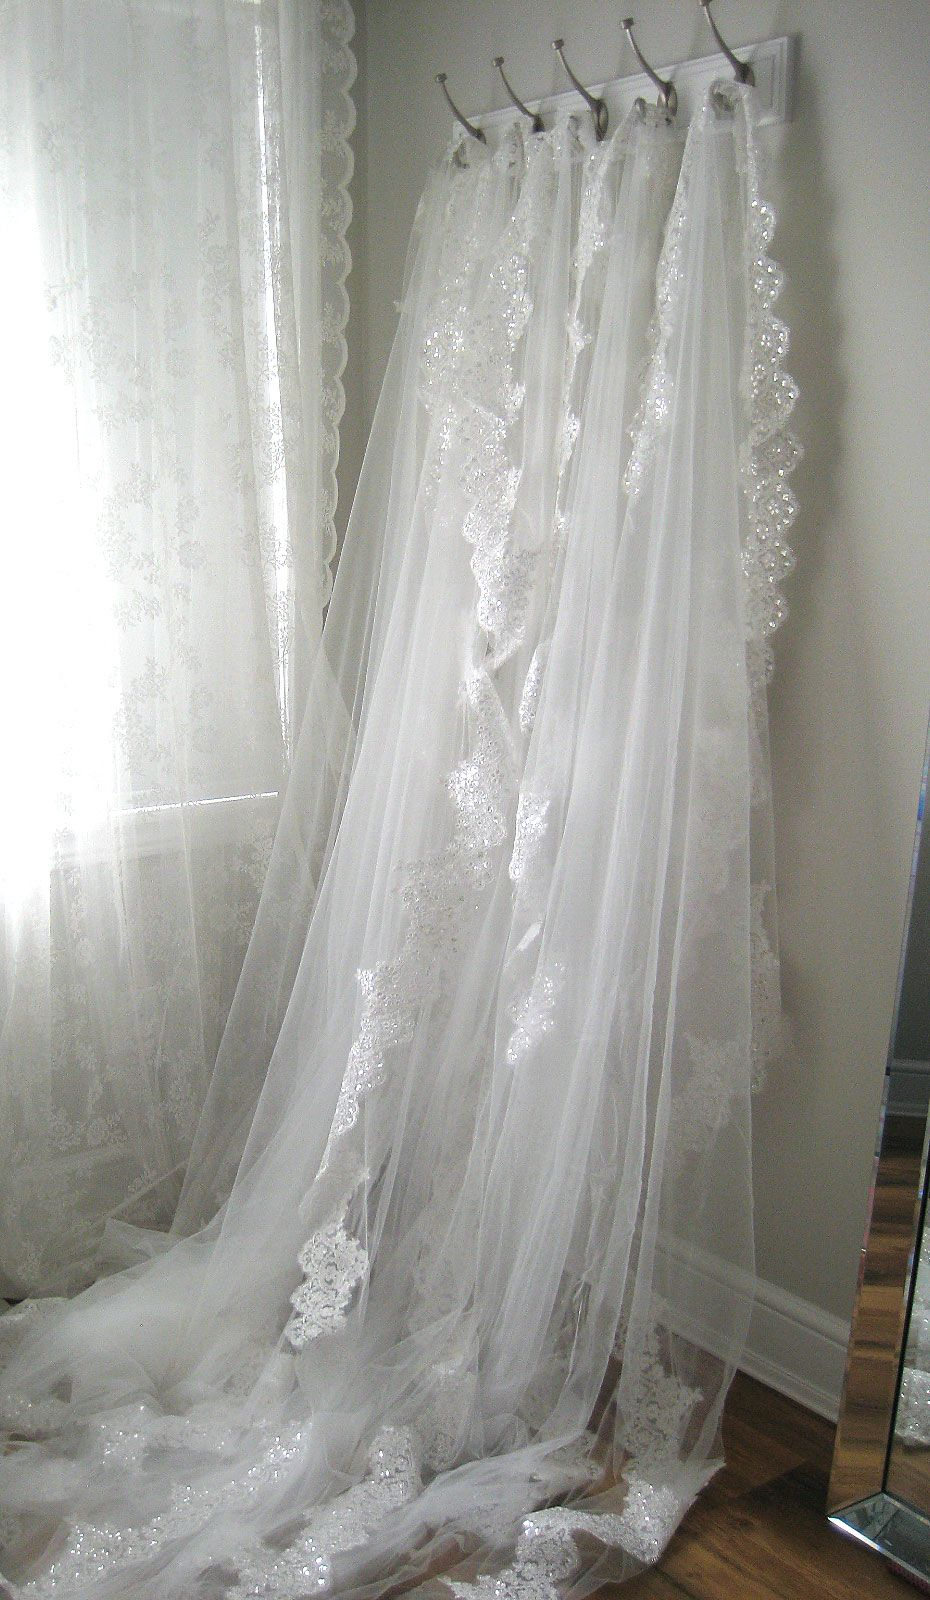 New Arrivals Cathedral Veils Wedding veil accessories